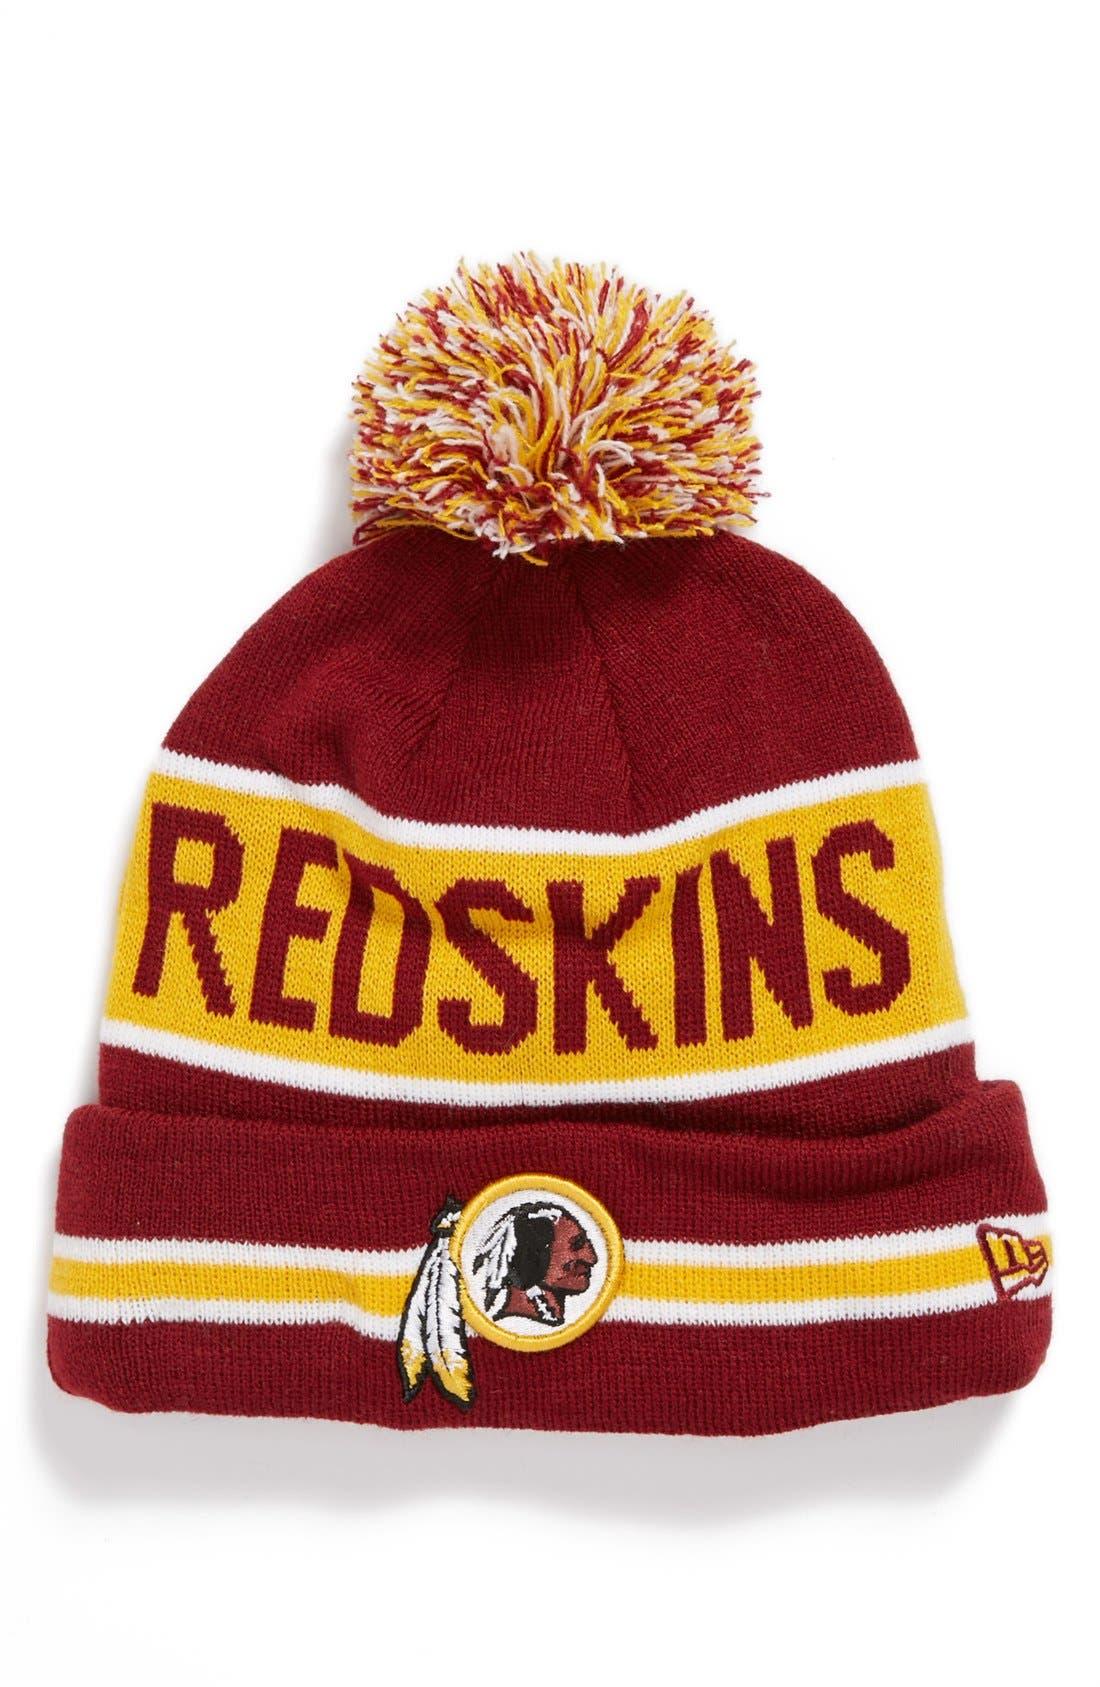 Main Image - New Era Cap 'The Coach - Washington Redskins' Knit Cap